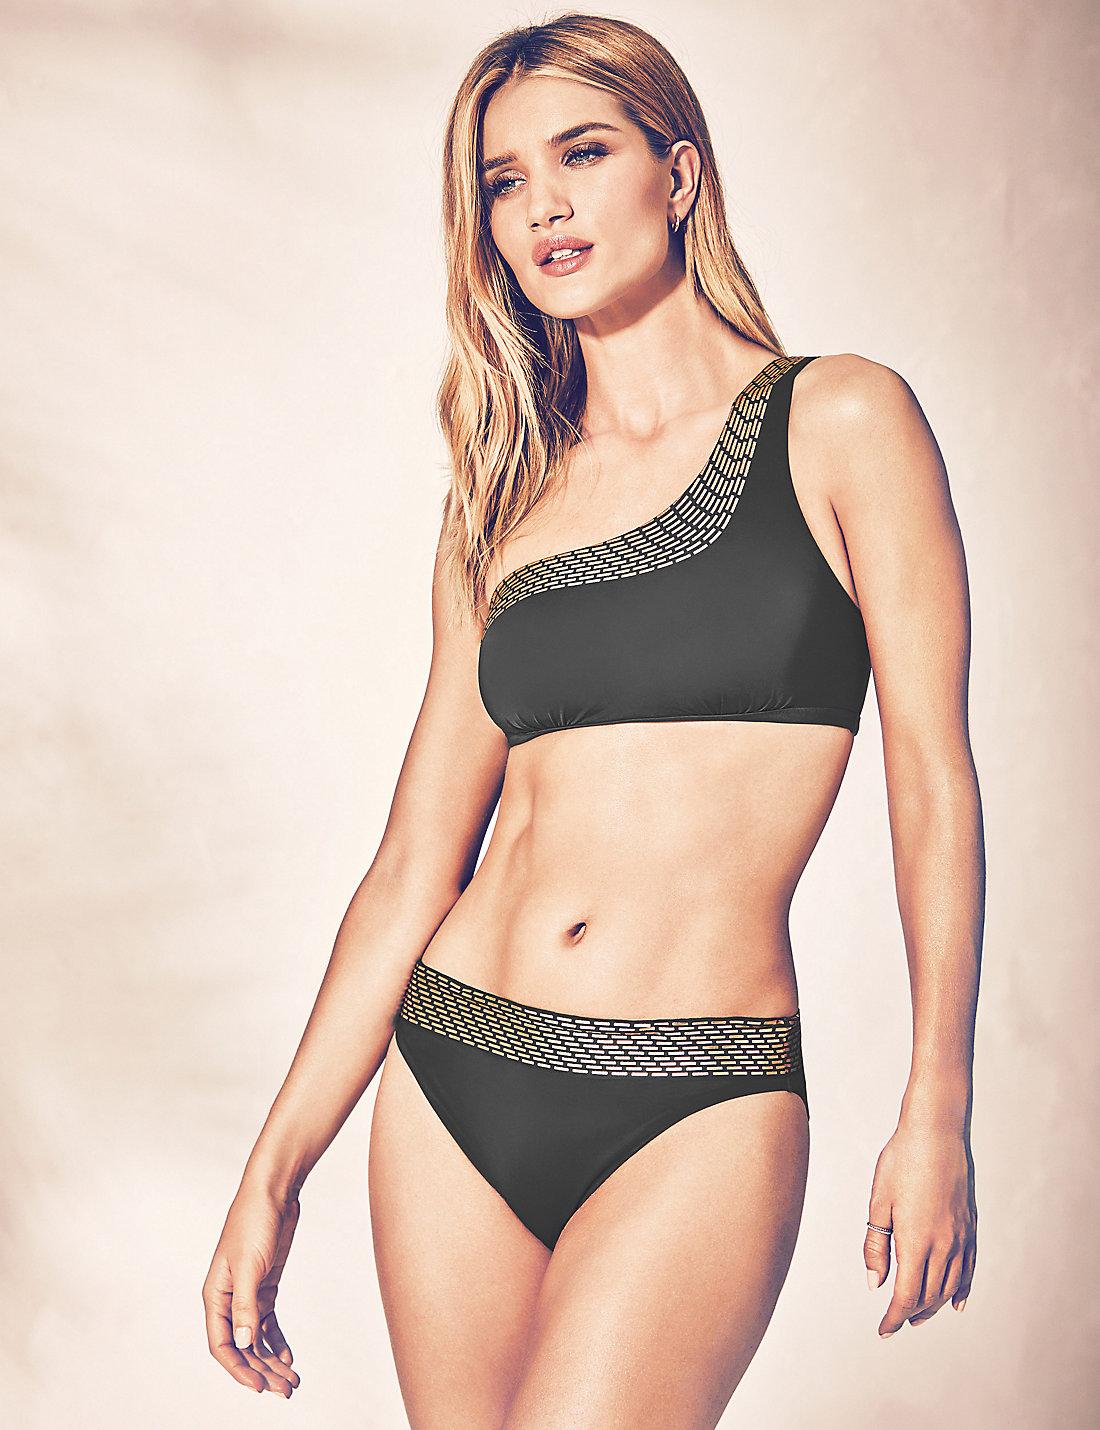 pics Rosie Huntington-Whiteley Launches New Swimwear Range for MS